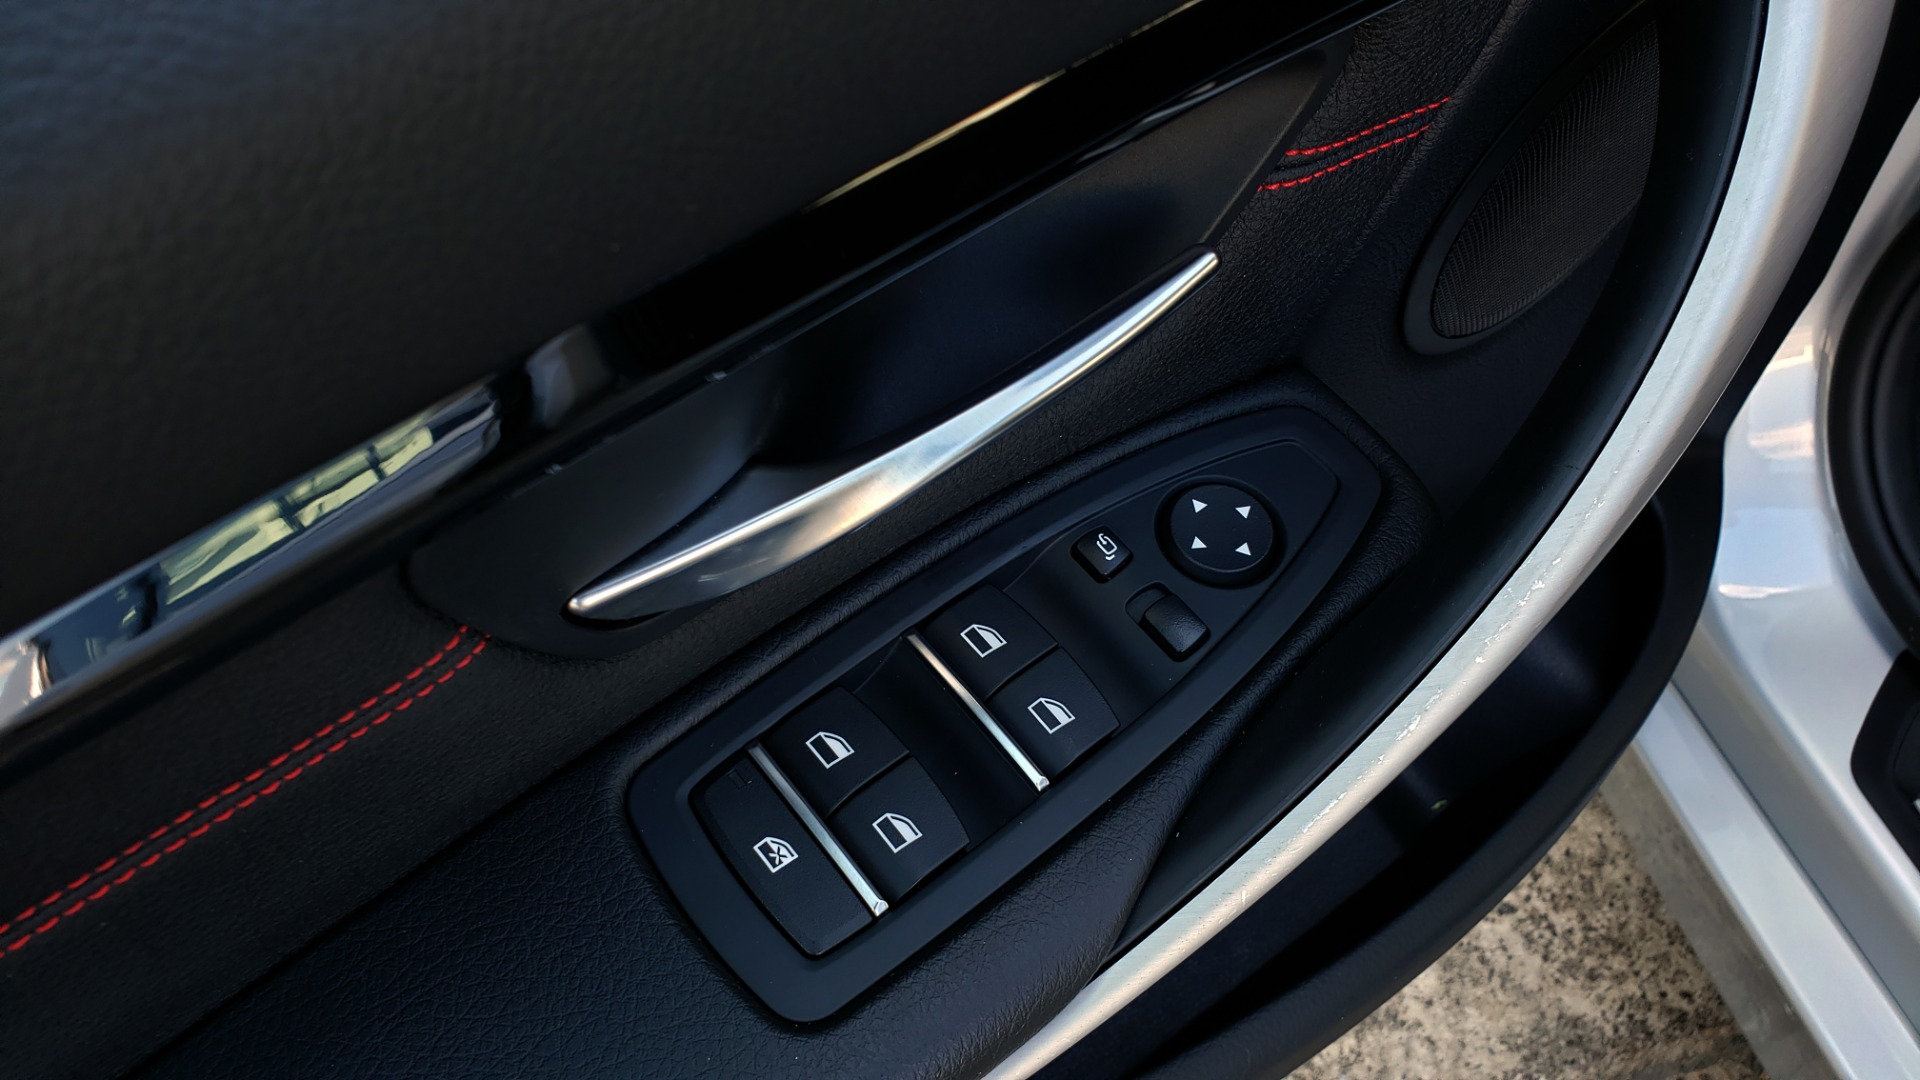 Used 2017 BMW 3 SERIES 330I SPORT SEDAN / DRVR ASST PKG / SUNROOF / REARVIEW for sale Sold at Formula Imports in Charlotte NC 28227 32